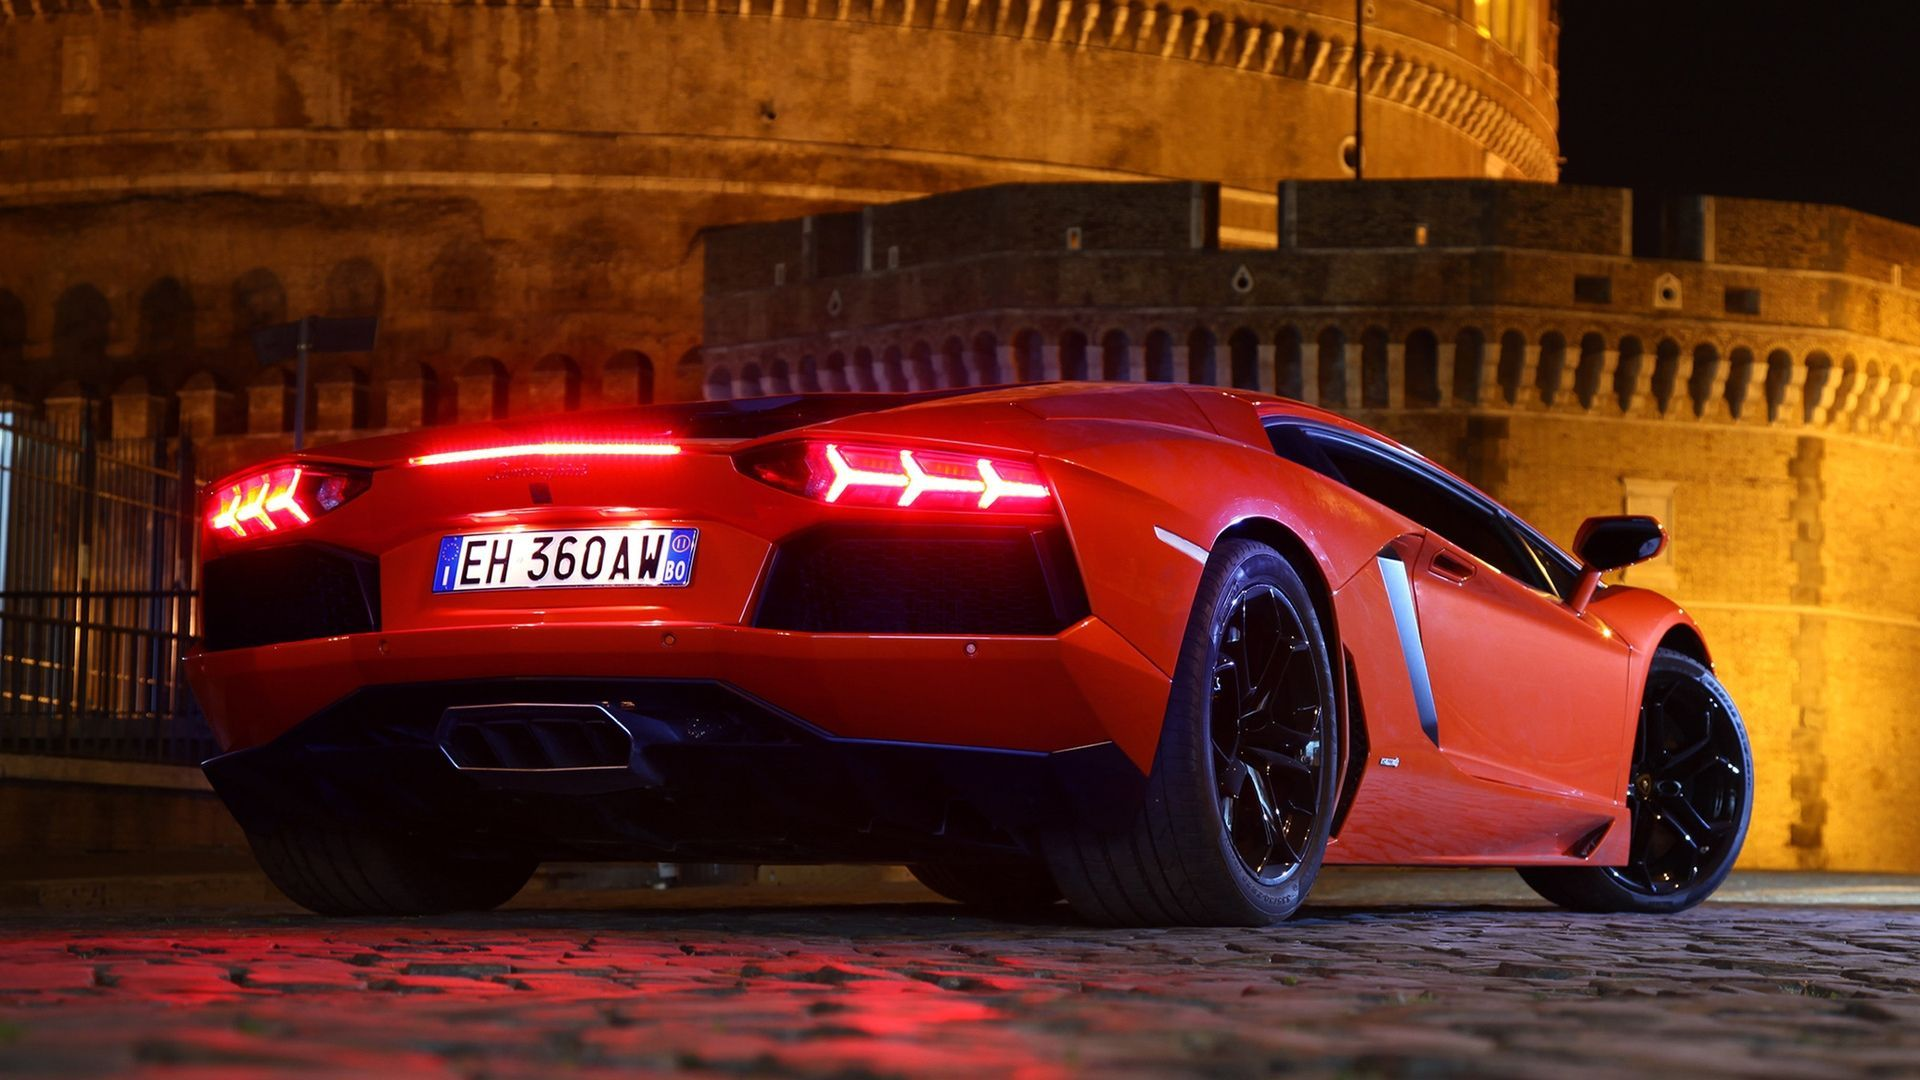 2018 Dodge Challenger Specs Feature Muscle Car Red Lamborghini Red Lamborghini Aventador Lamborghini Aventador Wallpaper